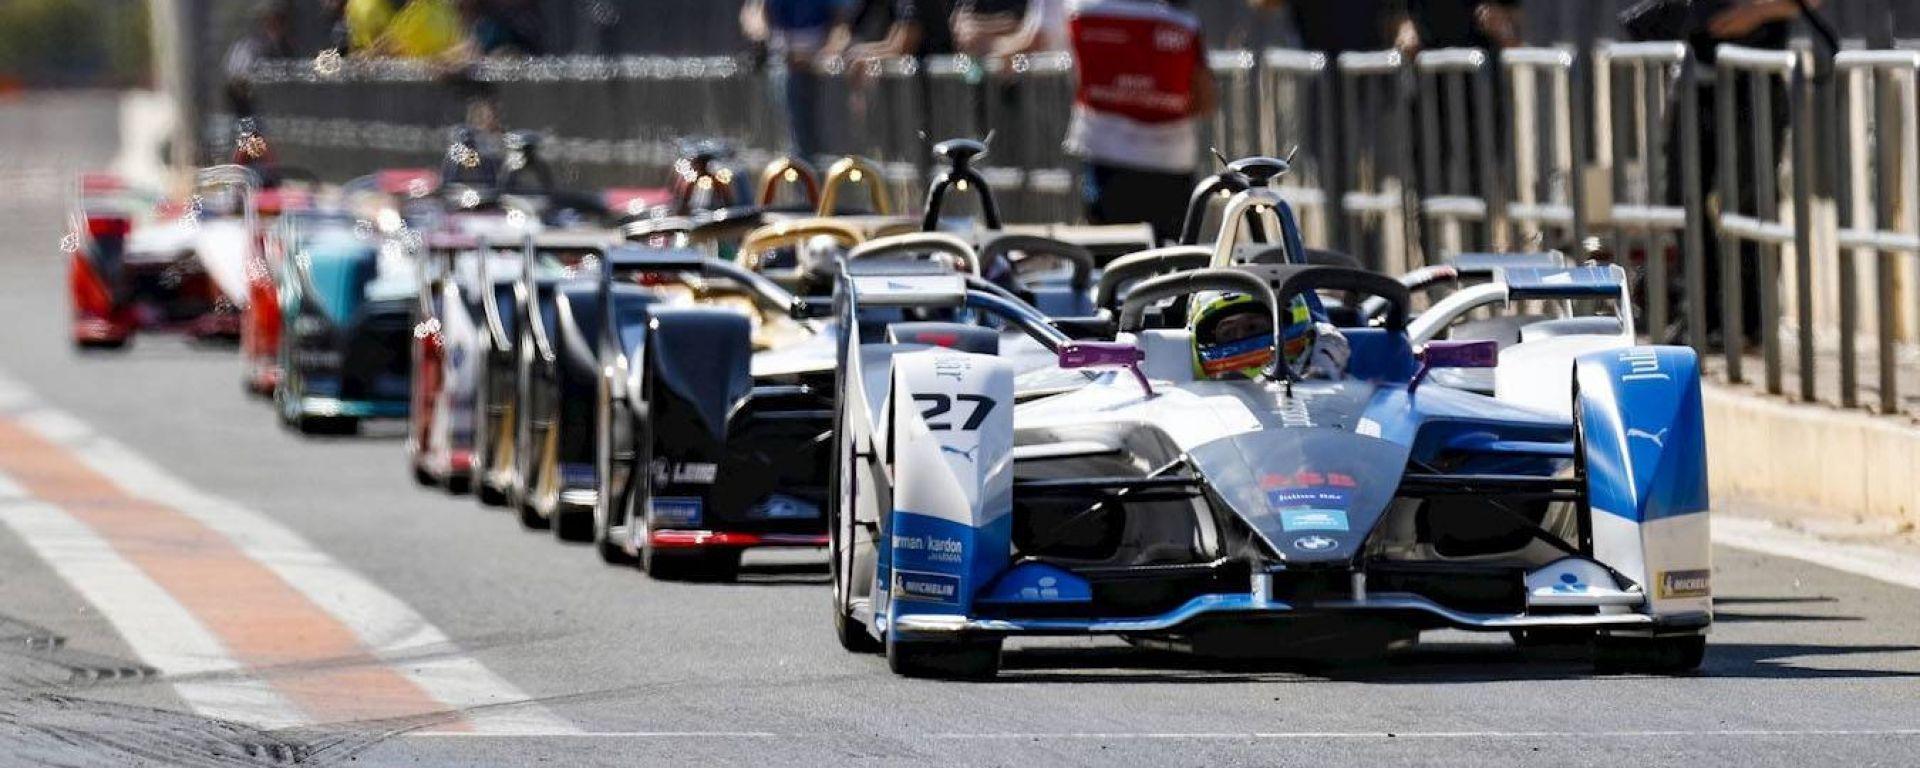 Formula E E-Prix Hong Kong: gli orari per vederla in tv